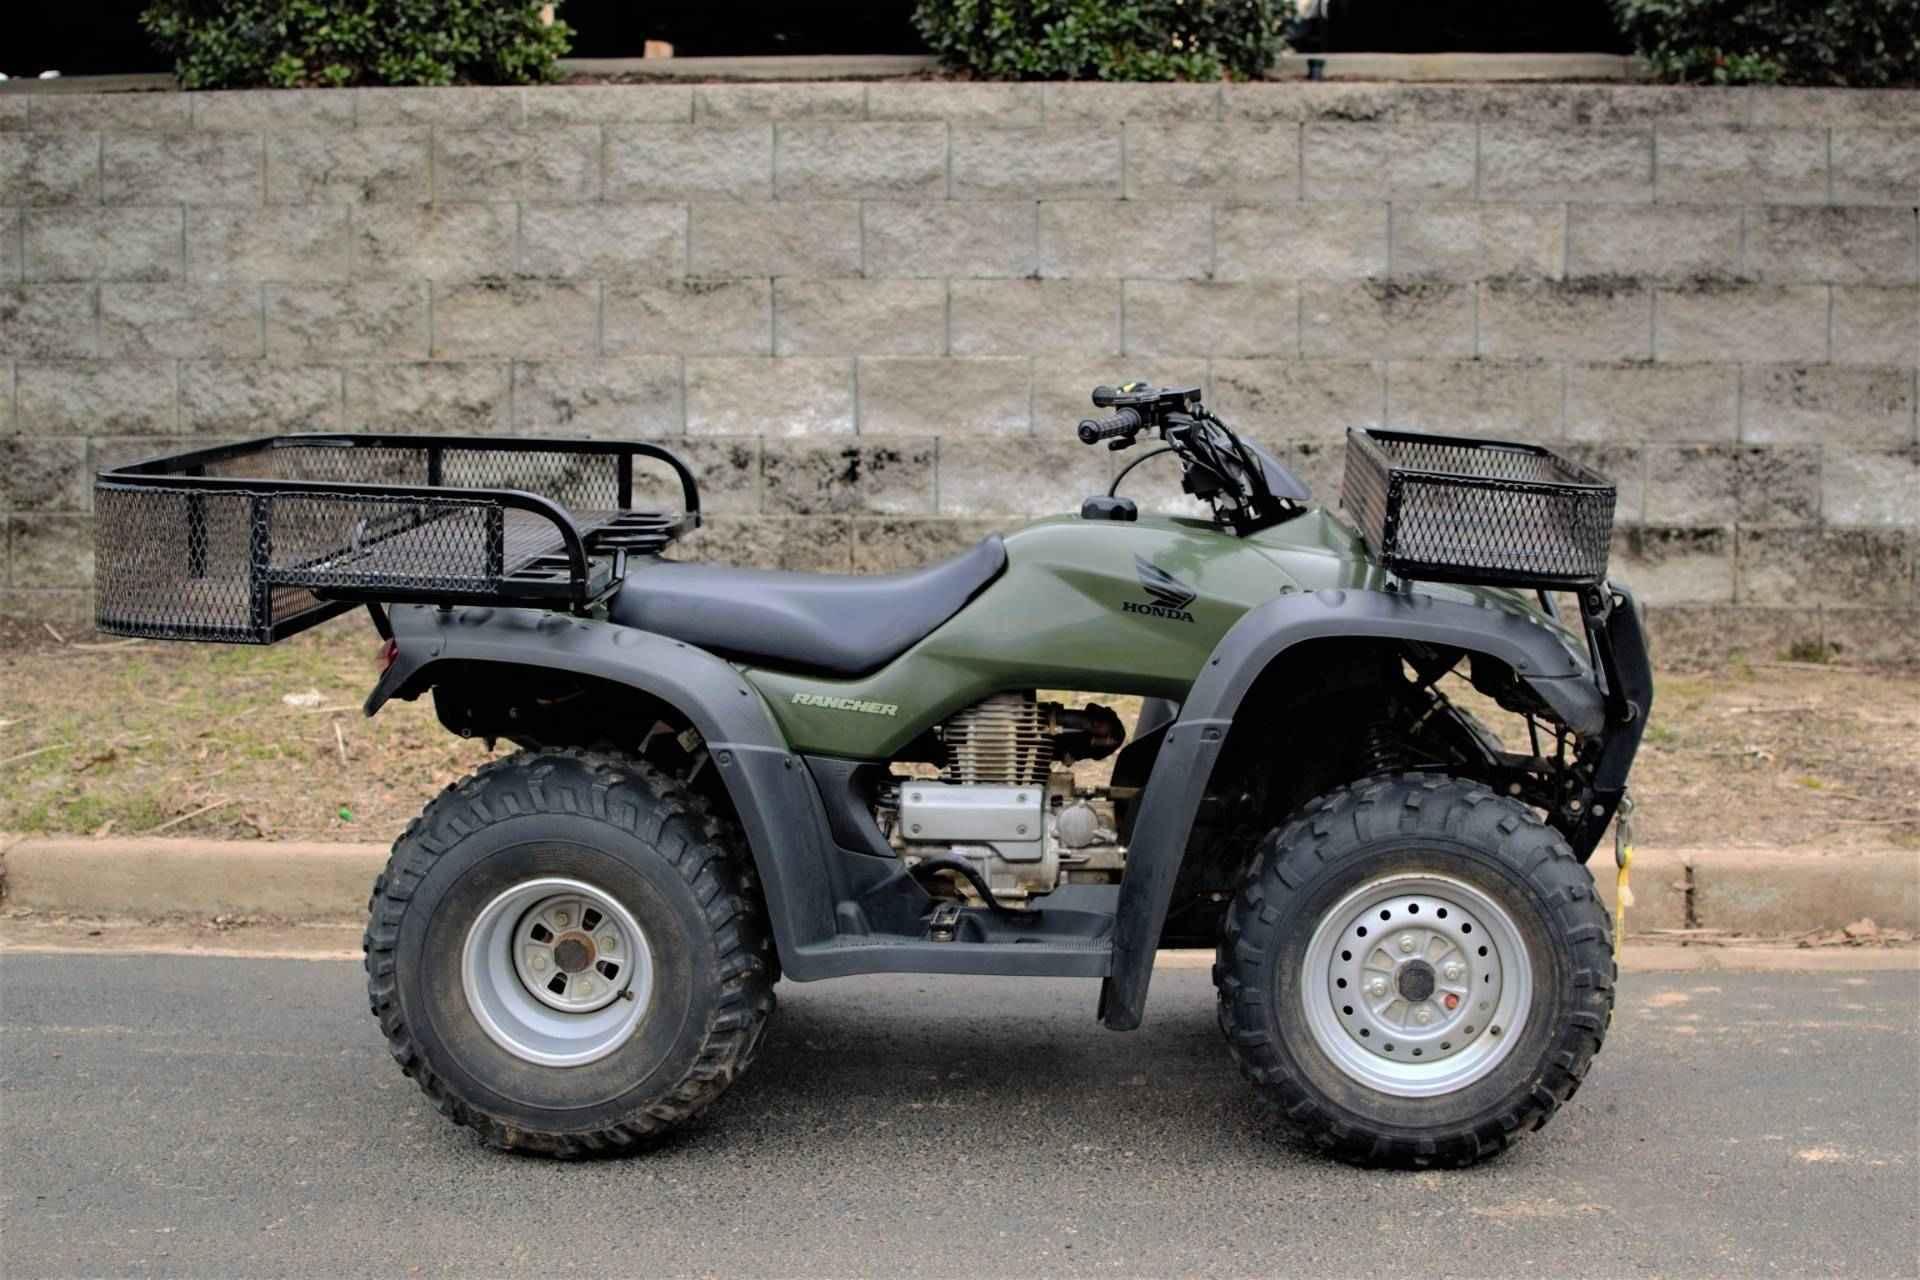 Used 2005 Honda Fourtraxa Ranchera Atvs For Sale In Mississippi On Atv Trades